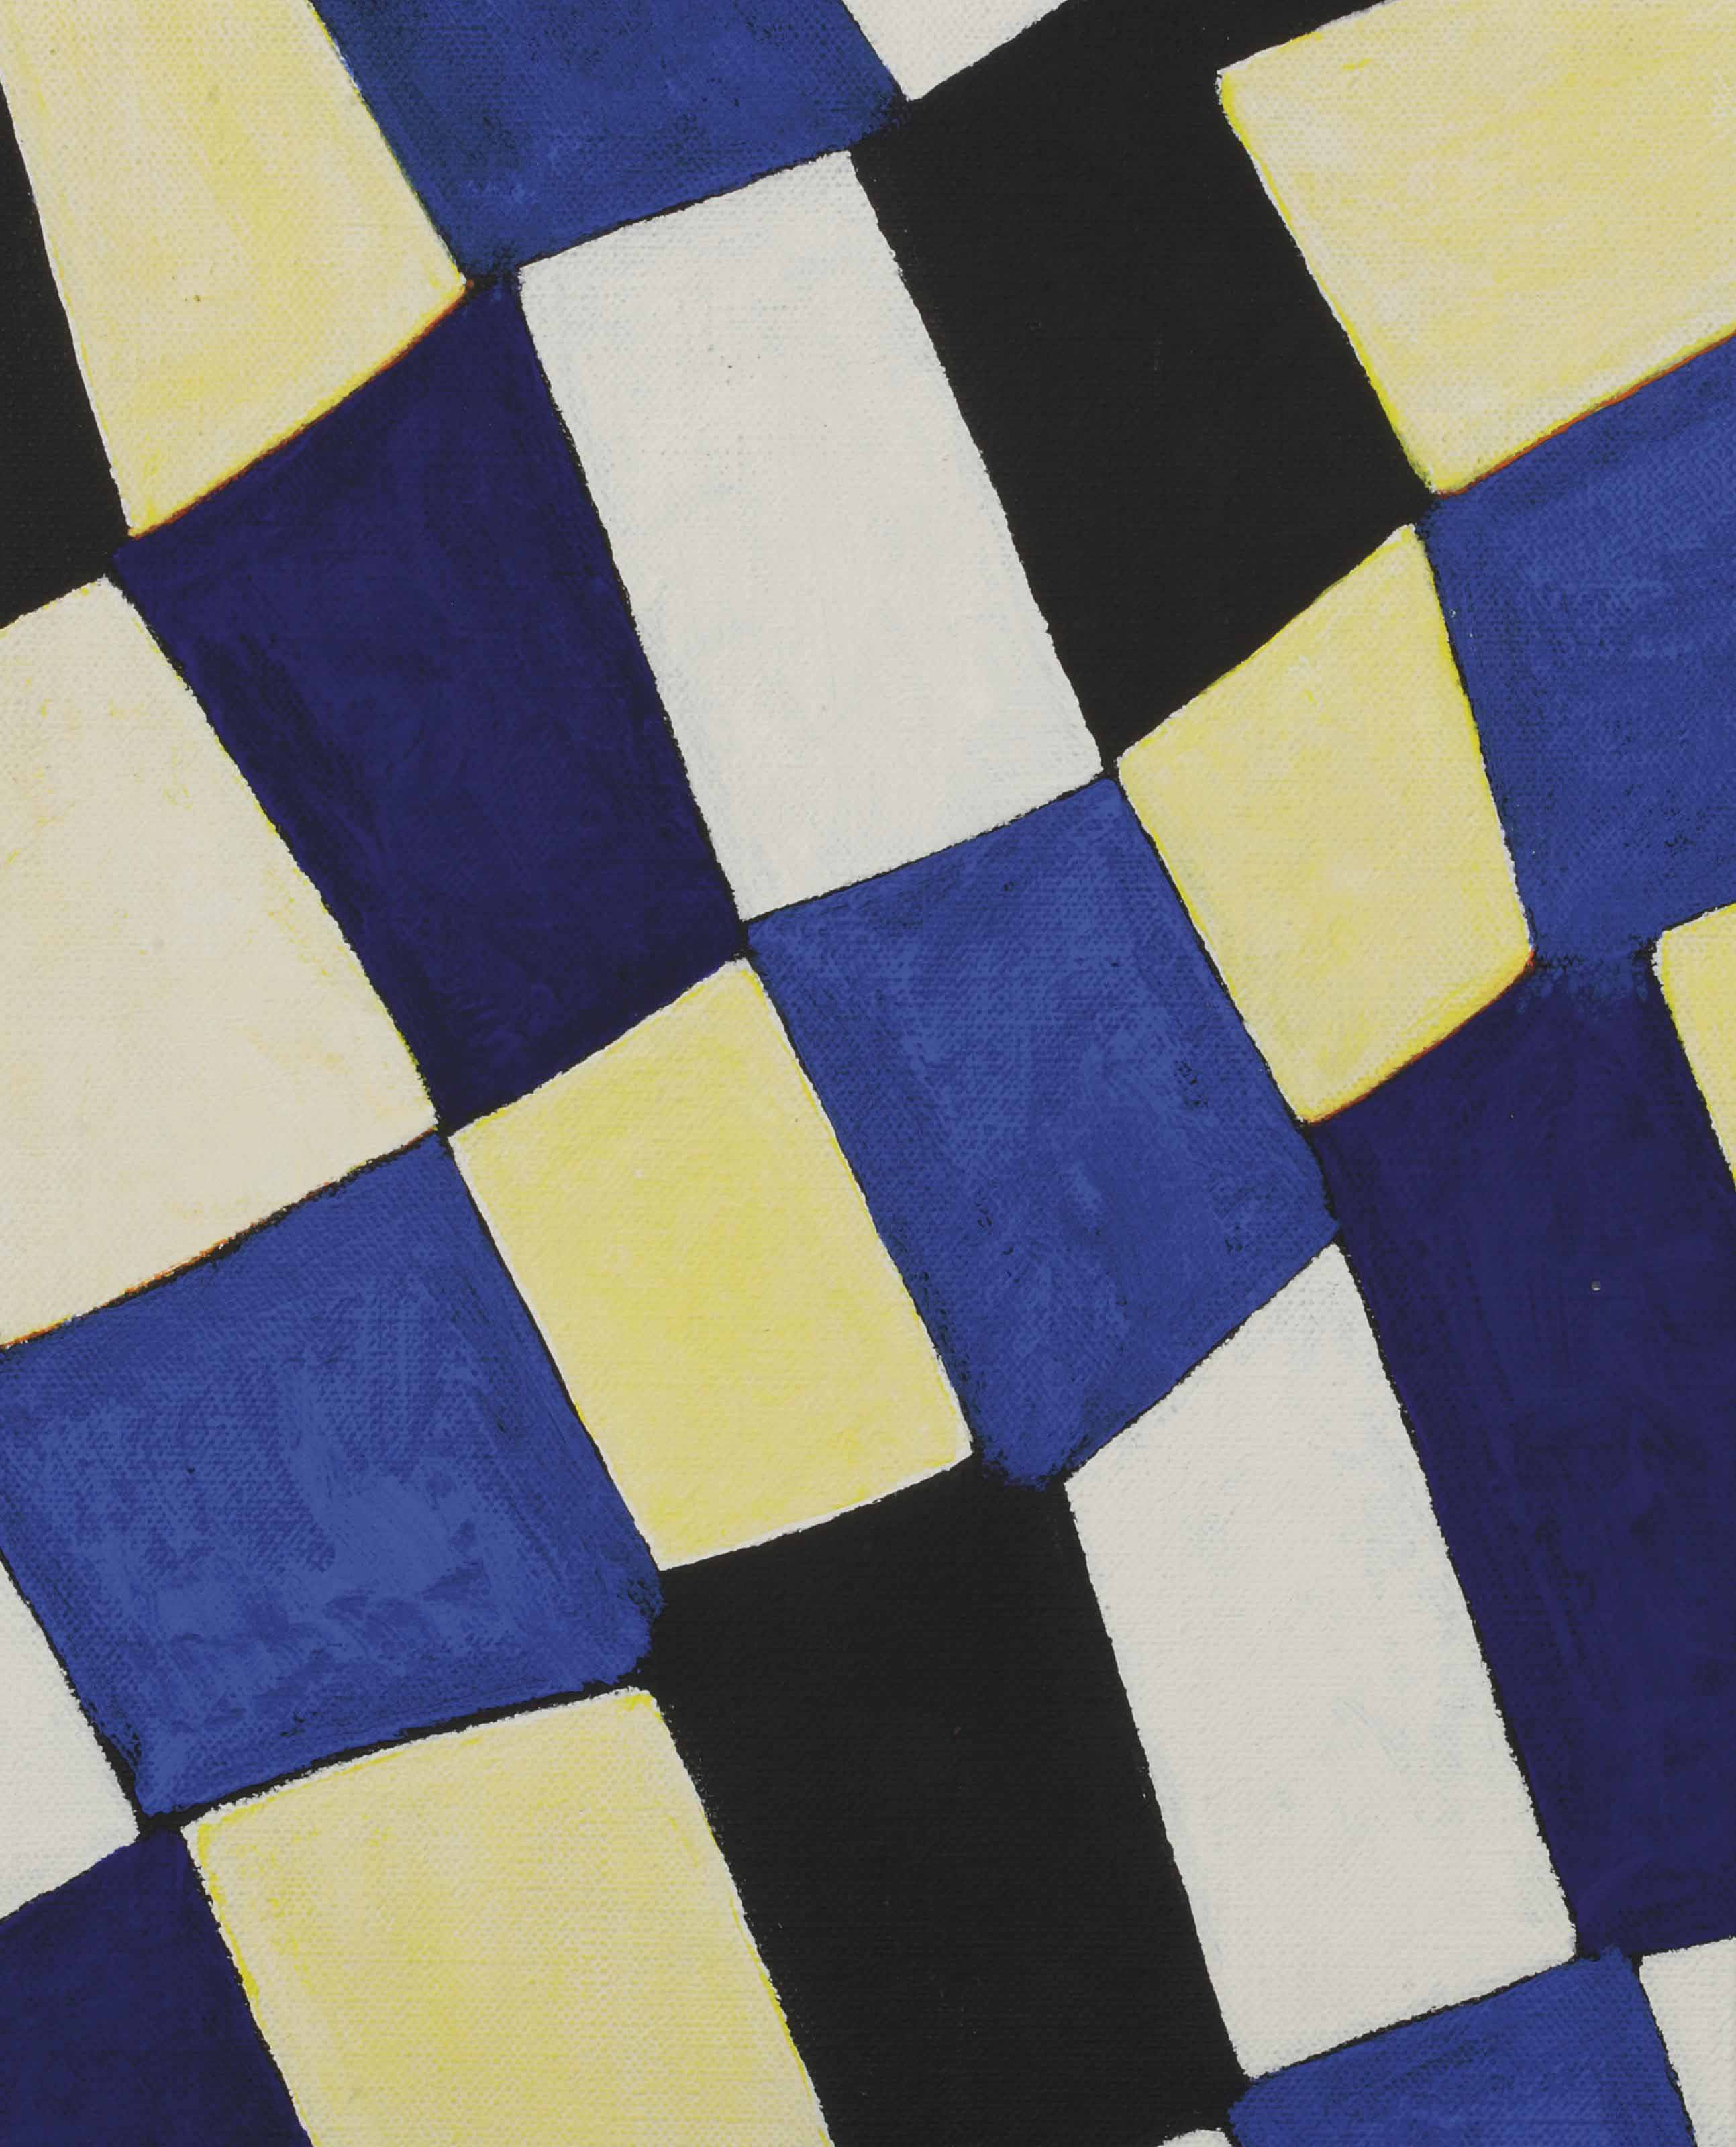 Wit-geel-blauw